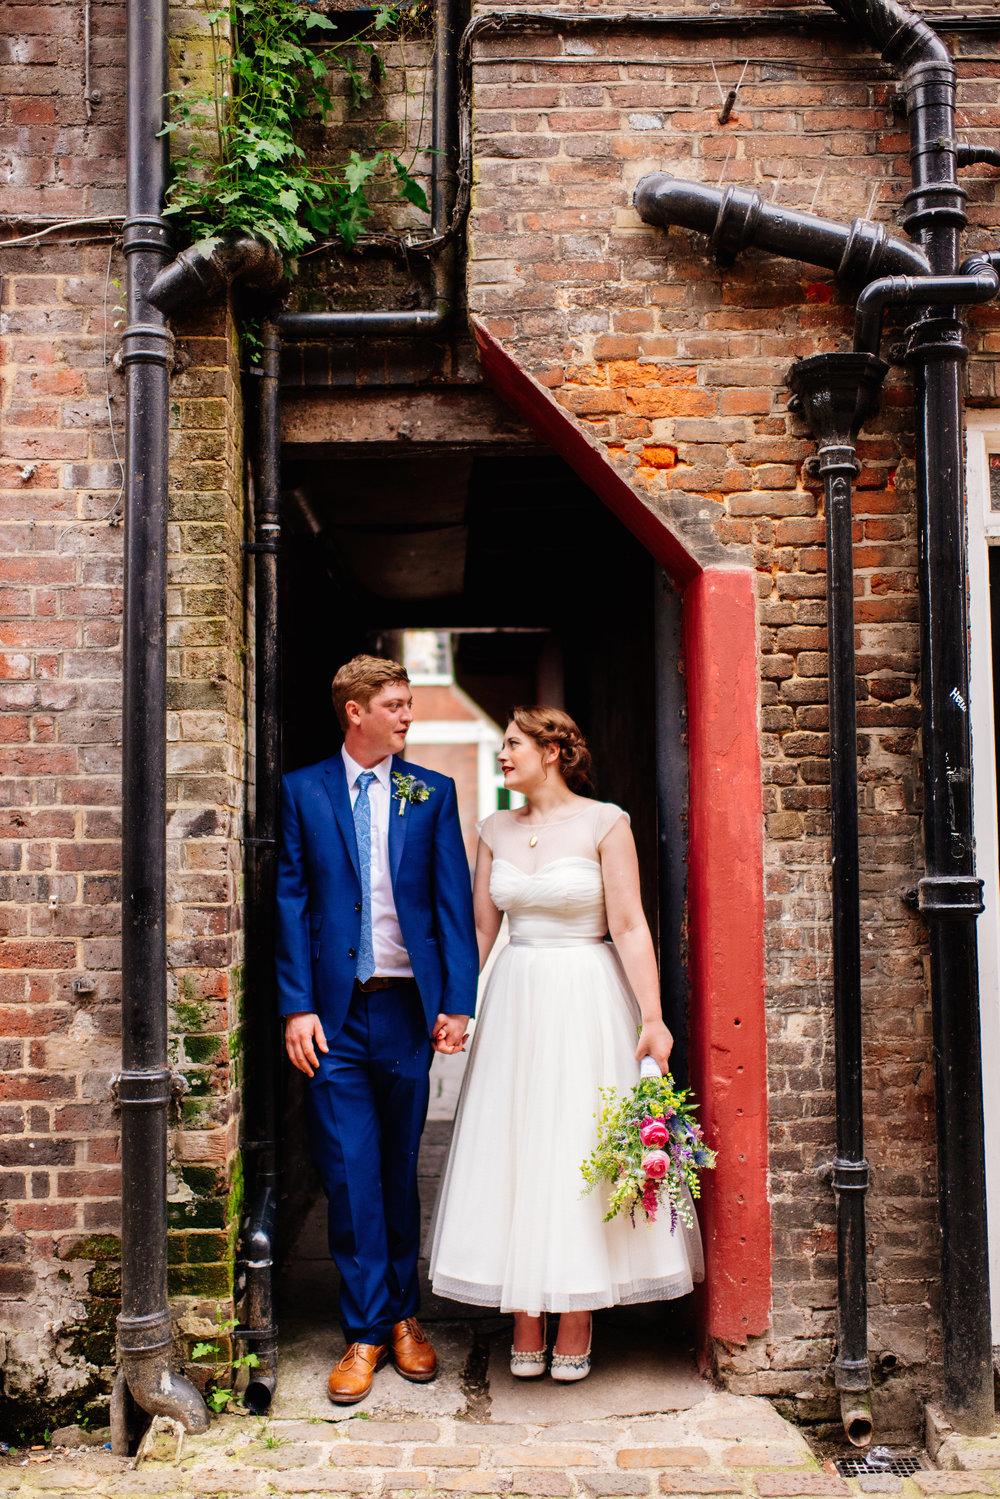 153 Emily + Daniel | Berkhamsted Towhall Wedding London Wedding Photographer Bride Groom Watford.jpg